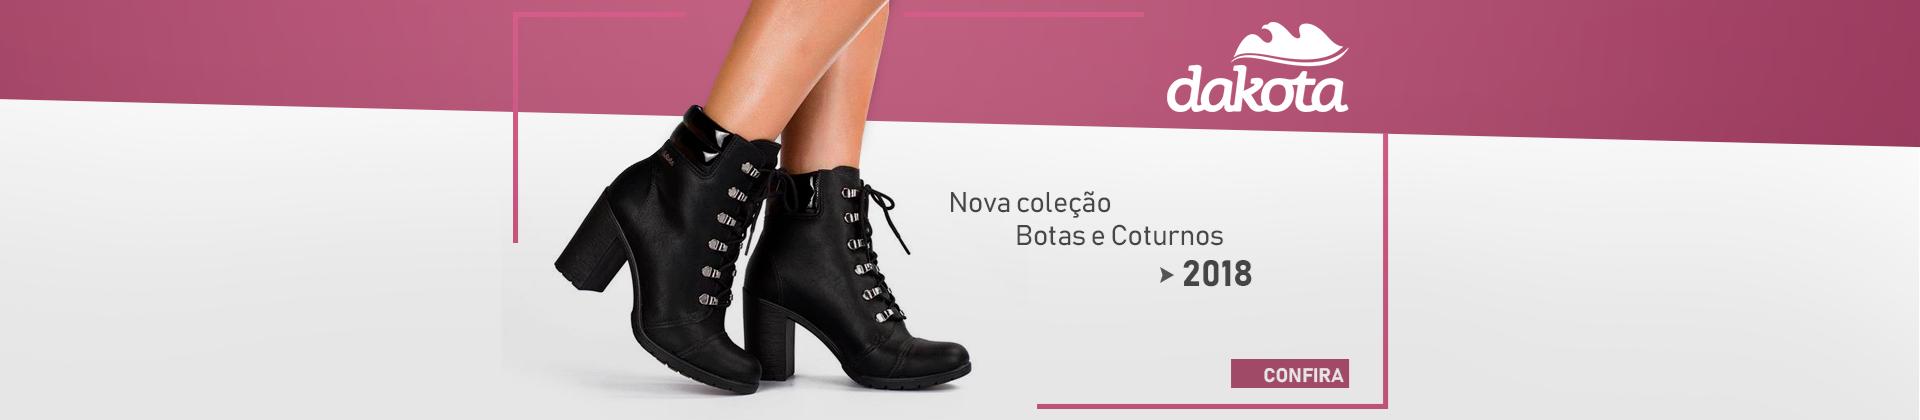 Botas / Coturnos